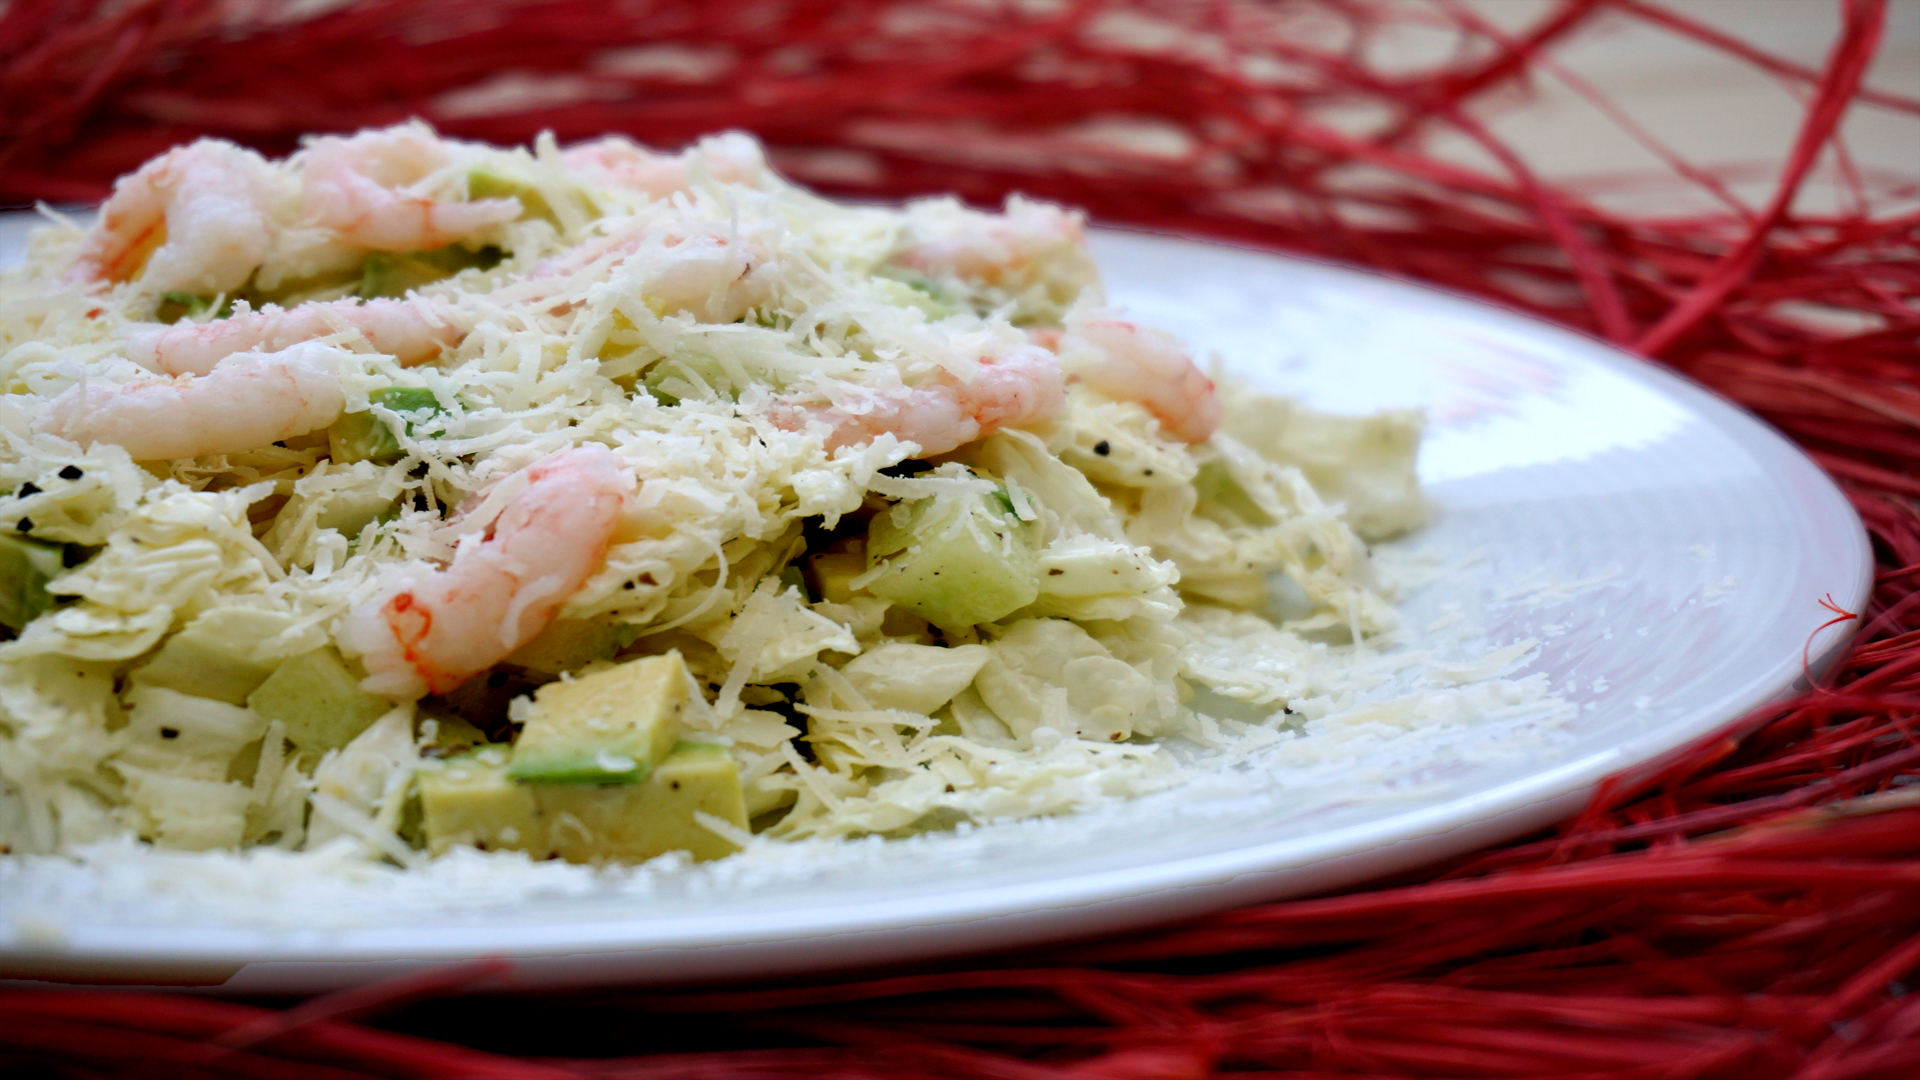 Gaivios žaliosios salotos